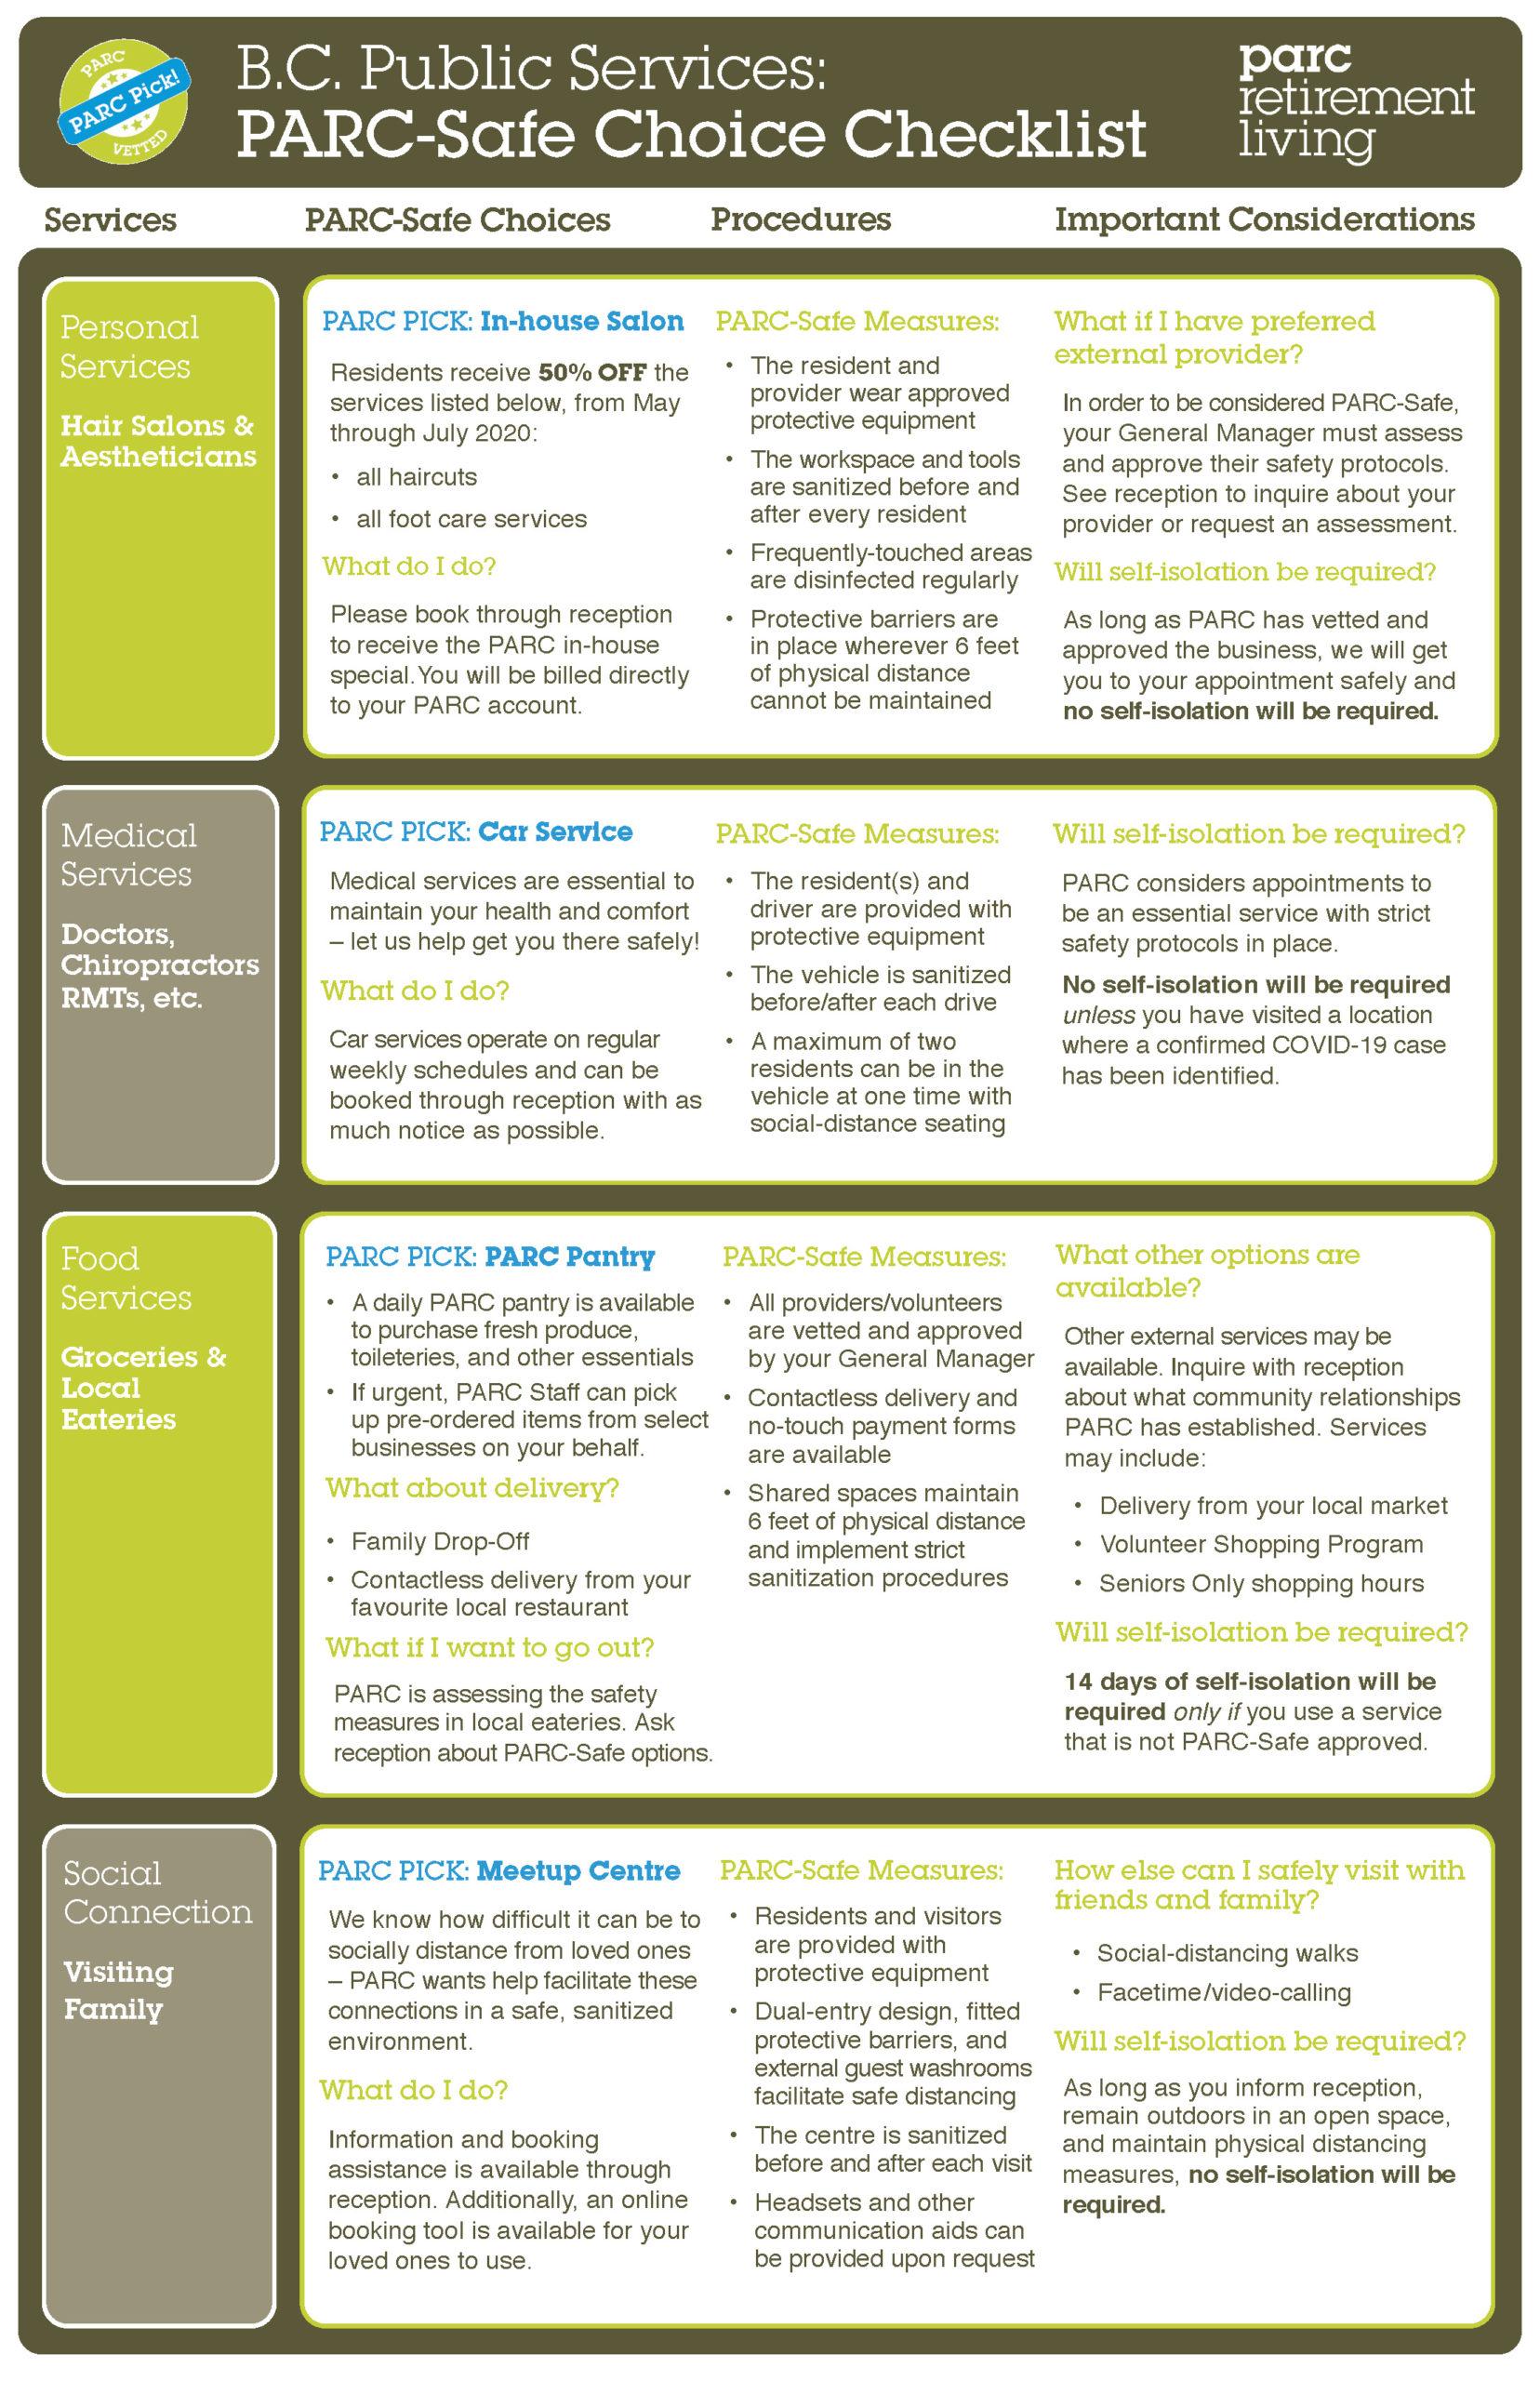 PARC Safe Choice Checklist